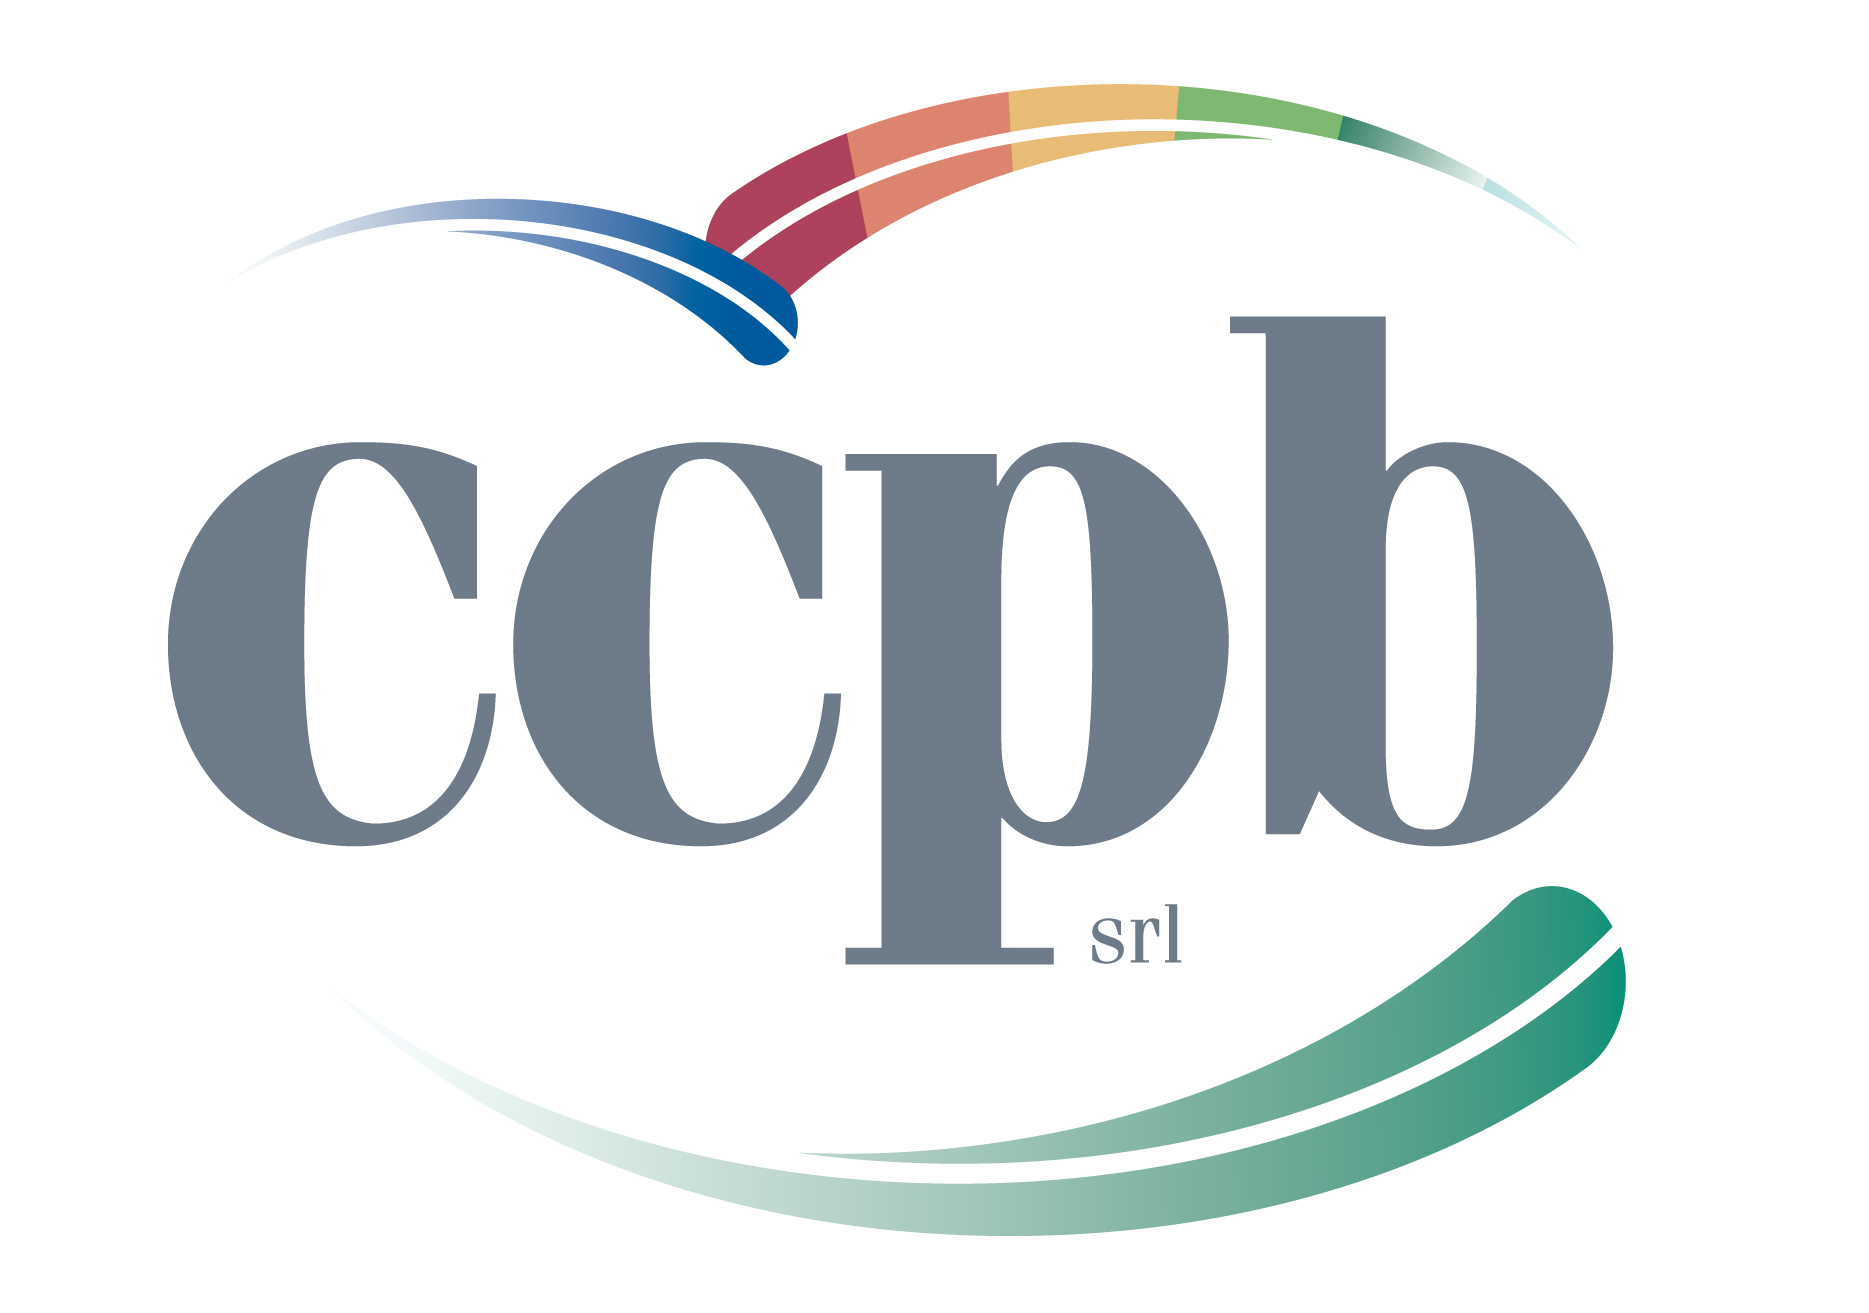 CCPB SRL